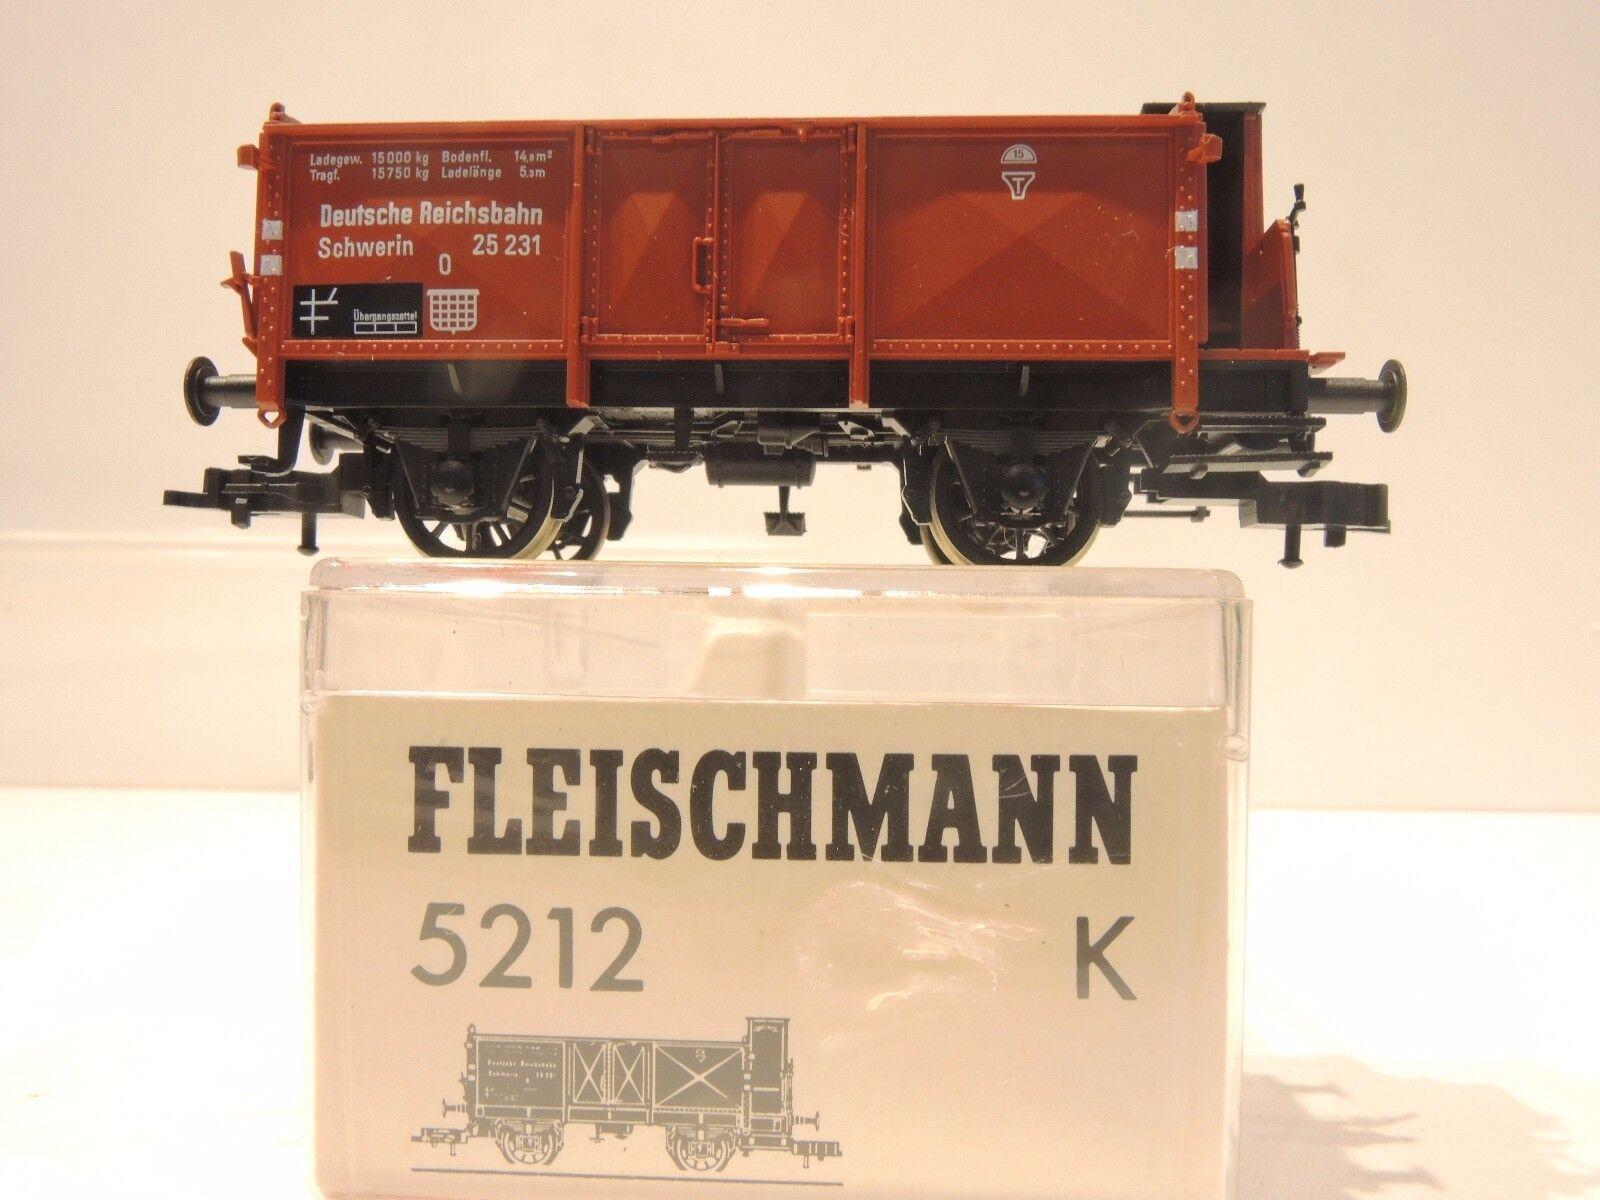 Fleischmann 5212 K ALTA BORDO carrello Schwerin    RP 25 raggi ruote    TOP    OVP